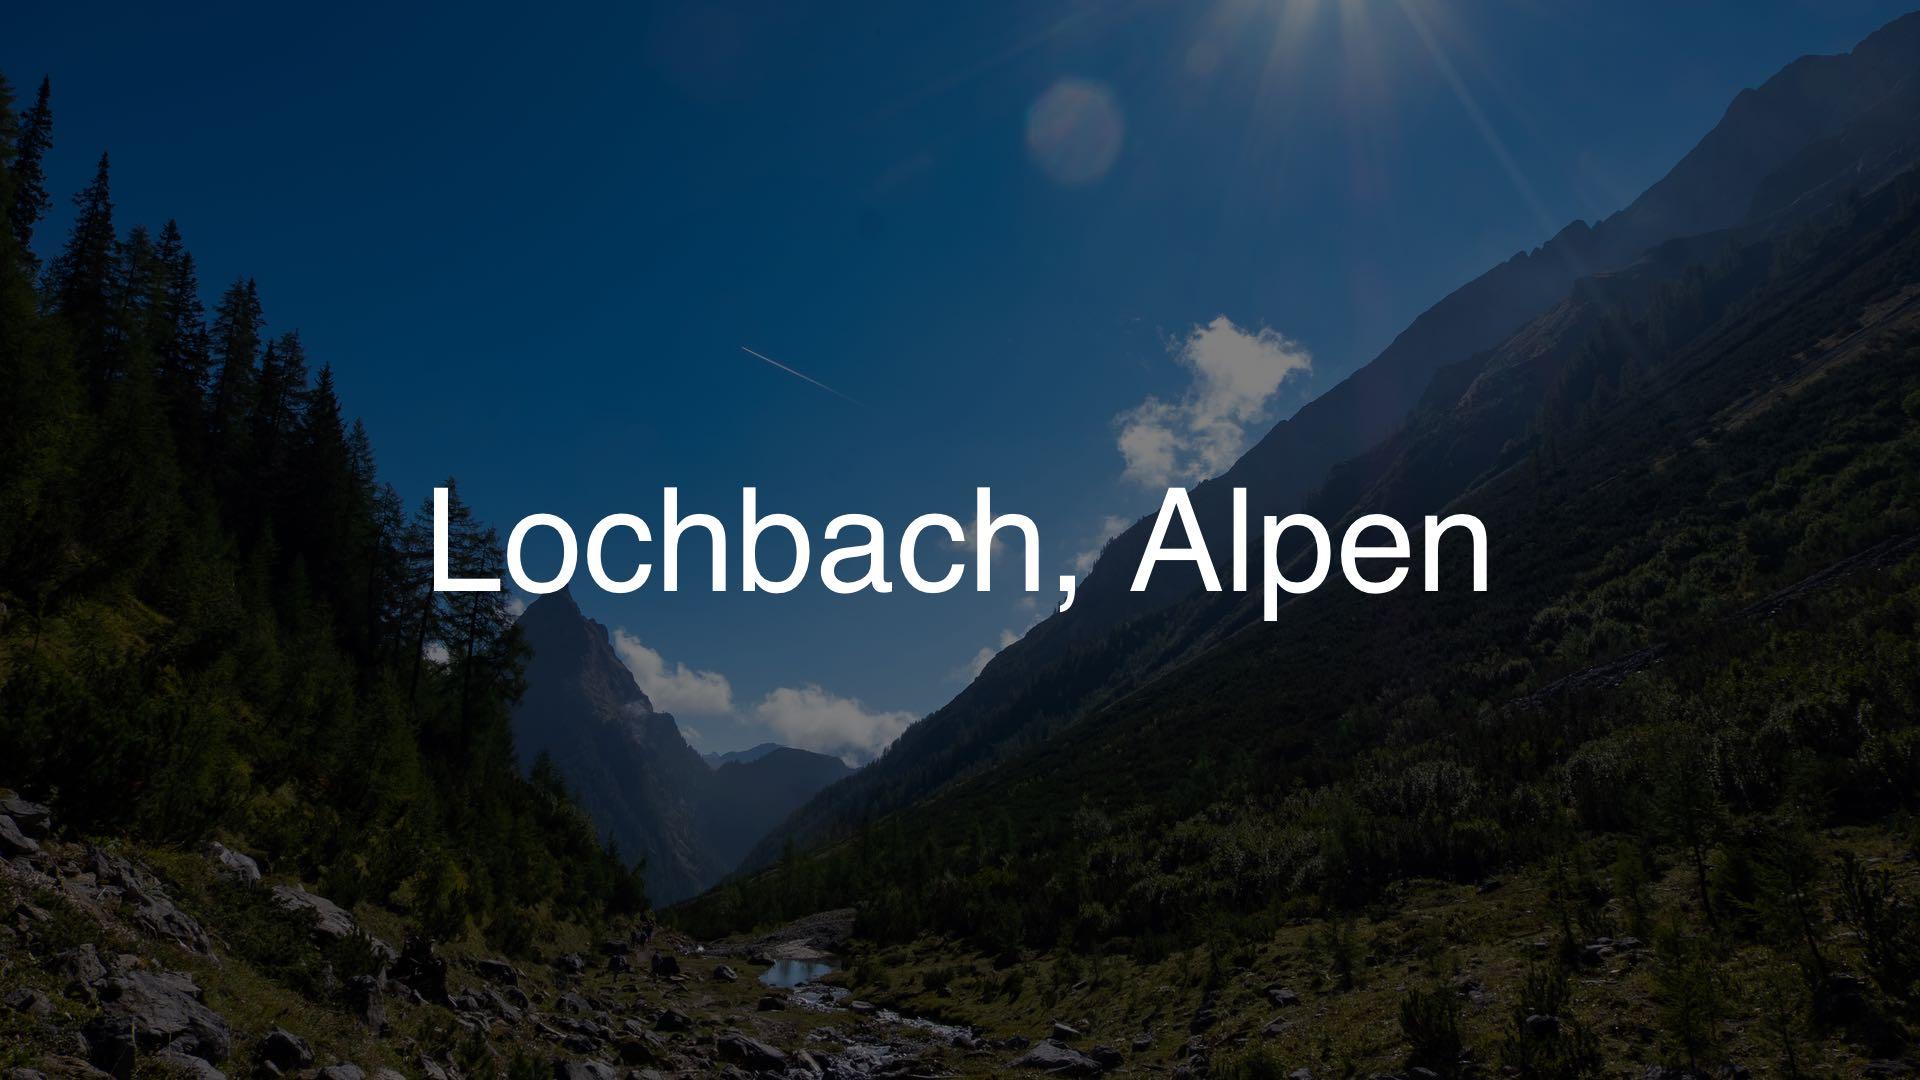 Lochbach 1920x1080 dark